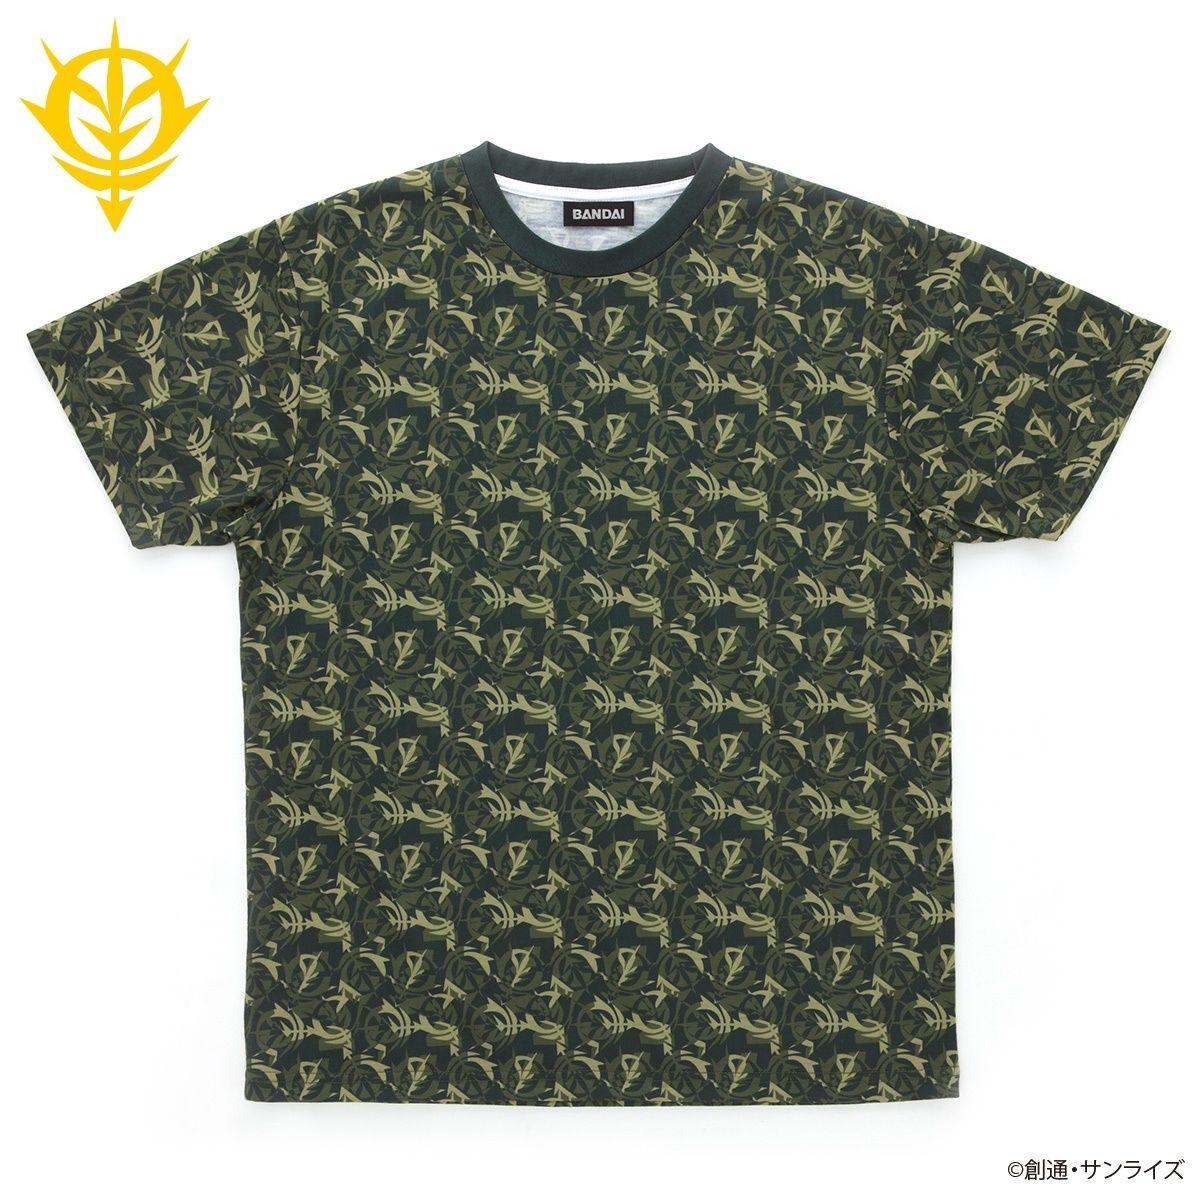 Mobile Suit Gundam Camouflage T-shirt